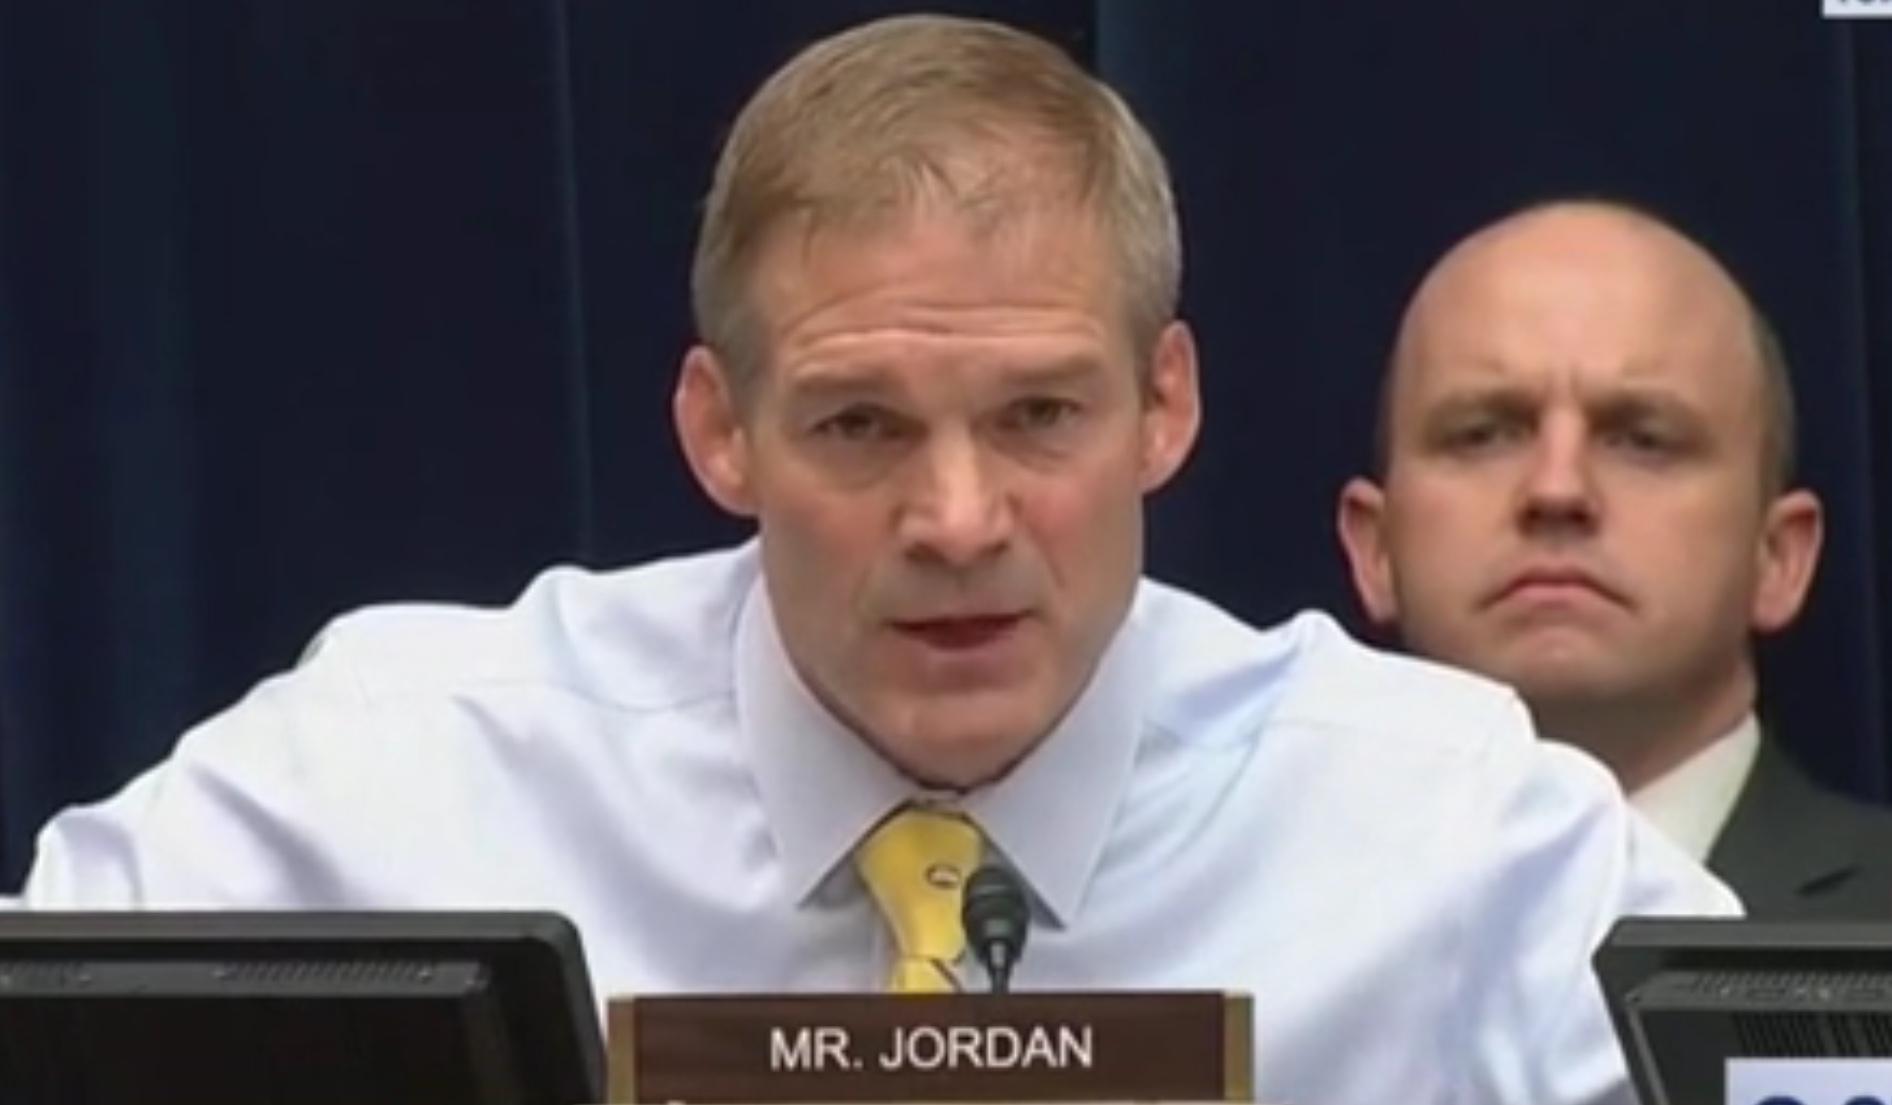 Ohio Republican Rep. Jim Jordan speaks at the House Oversight on Civil Rights and Civil Liberties subcommittee, Sept. 11, 2019. CSPAN screenshot.